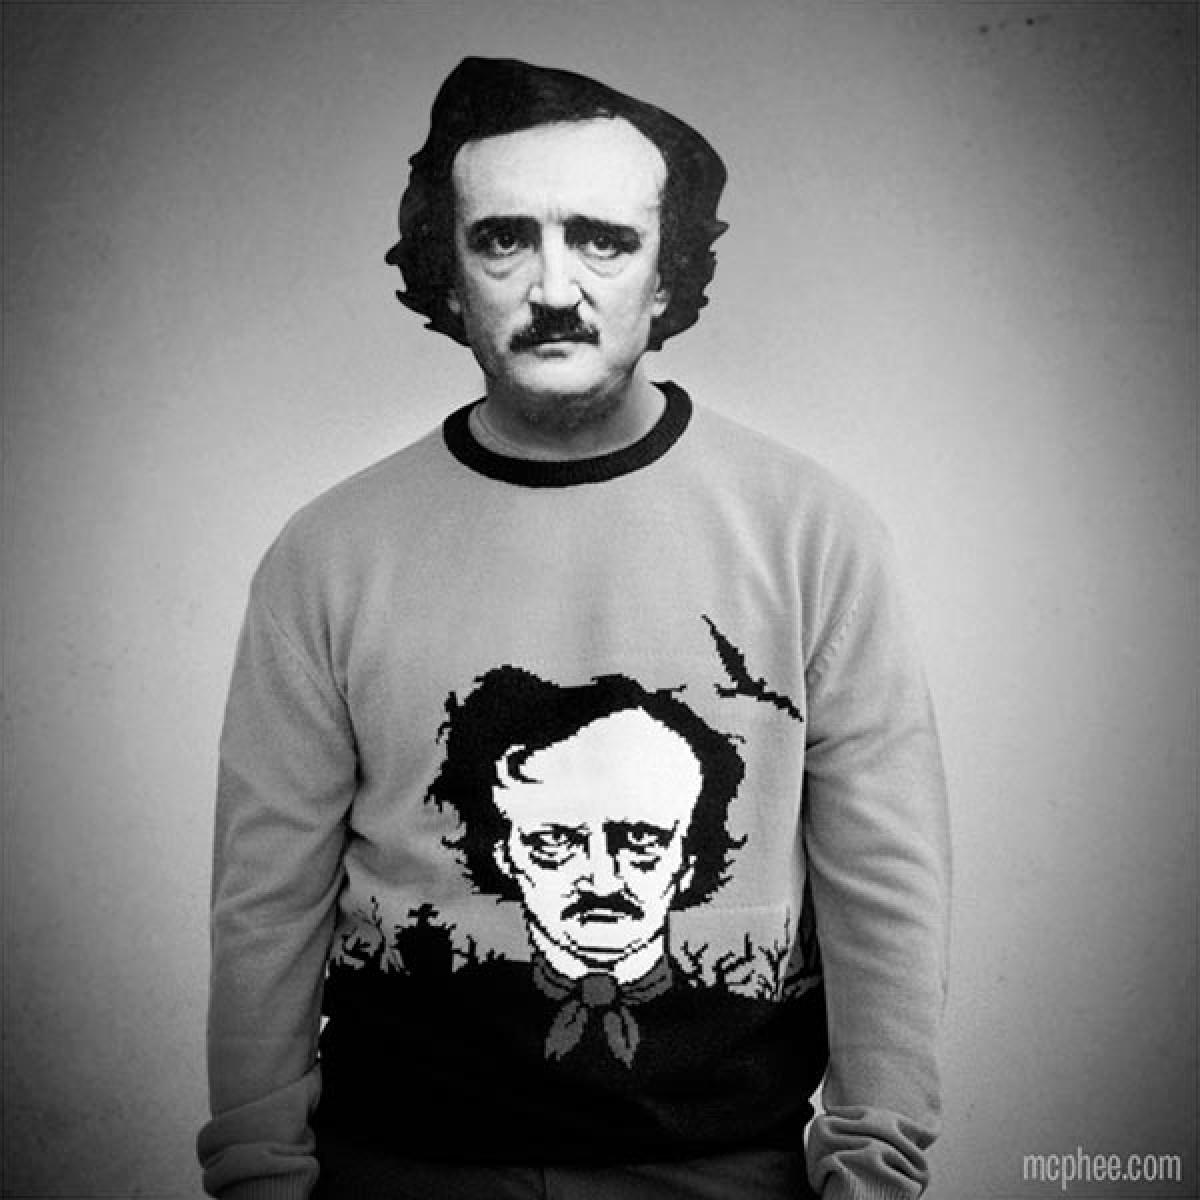 edgar_allan_poe-sweater-poe